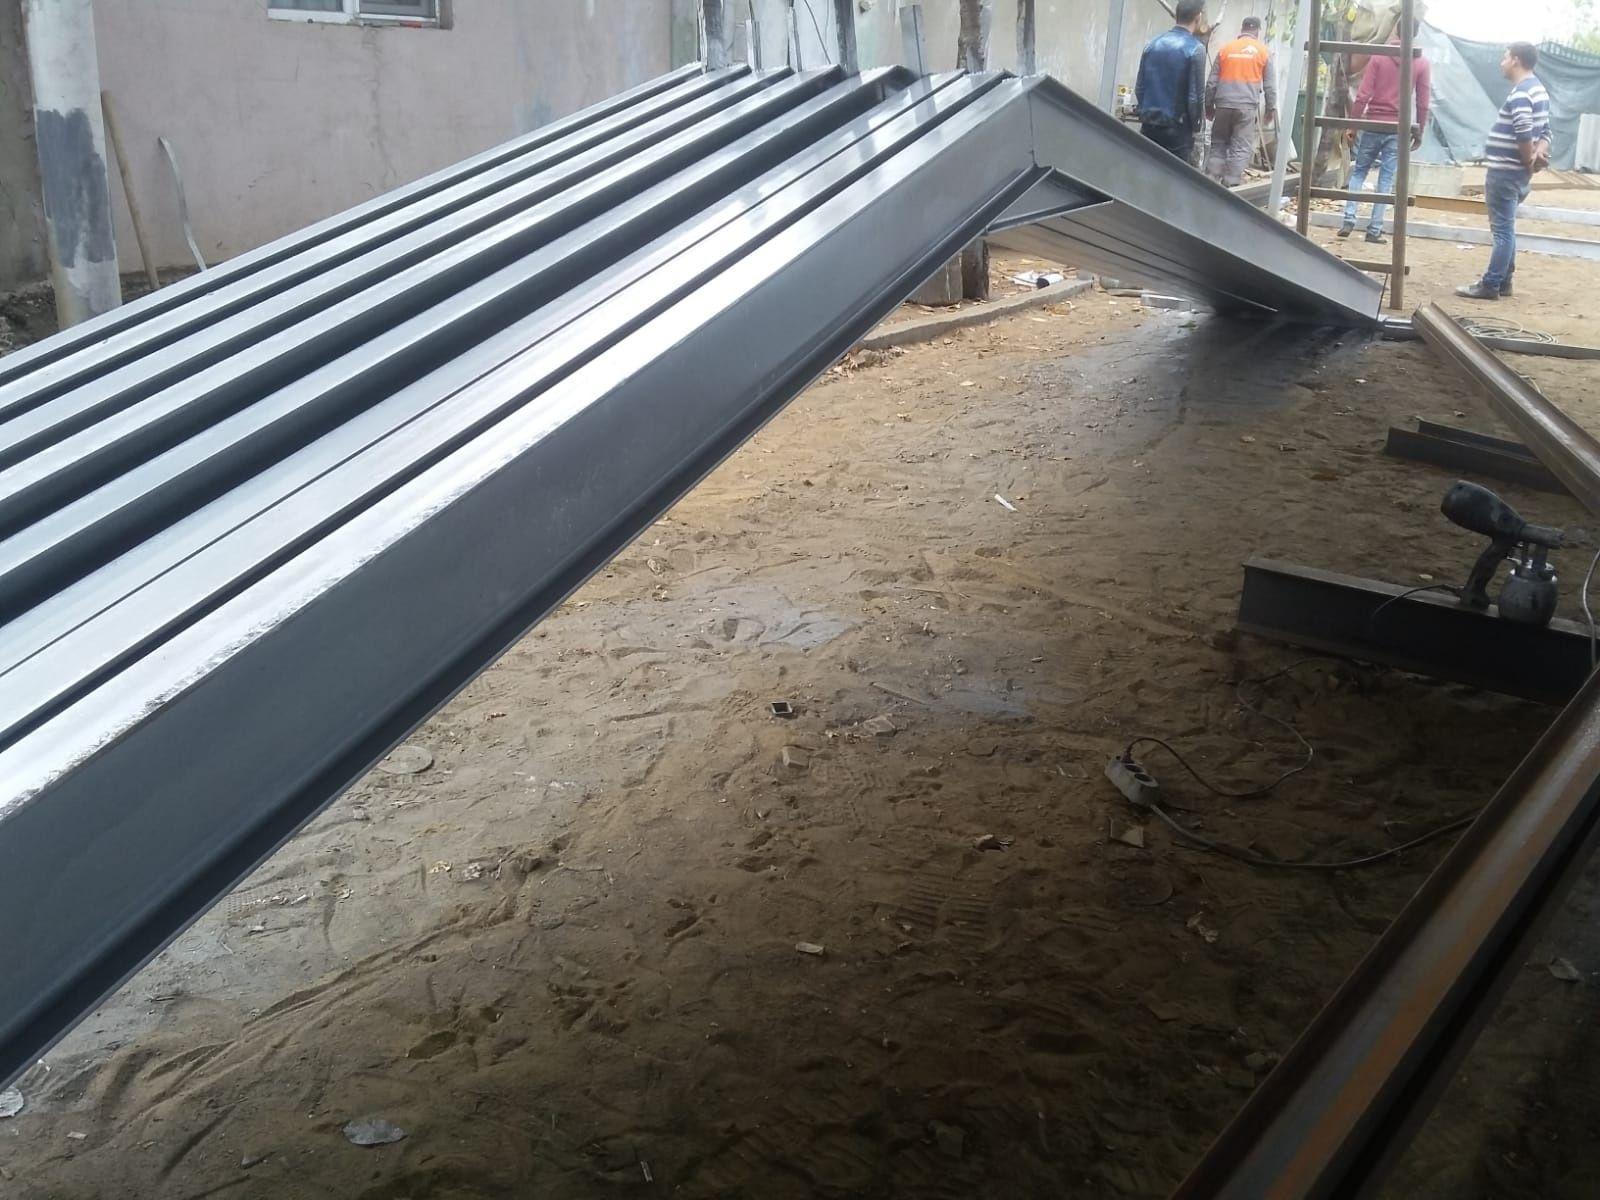 Vand hală metalica 11,75m×30m×3m